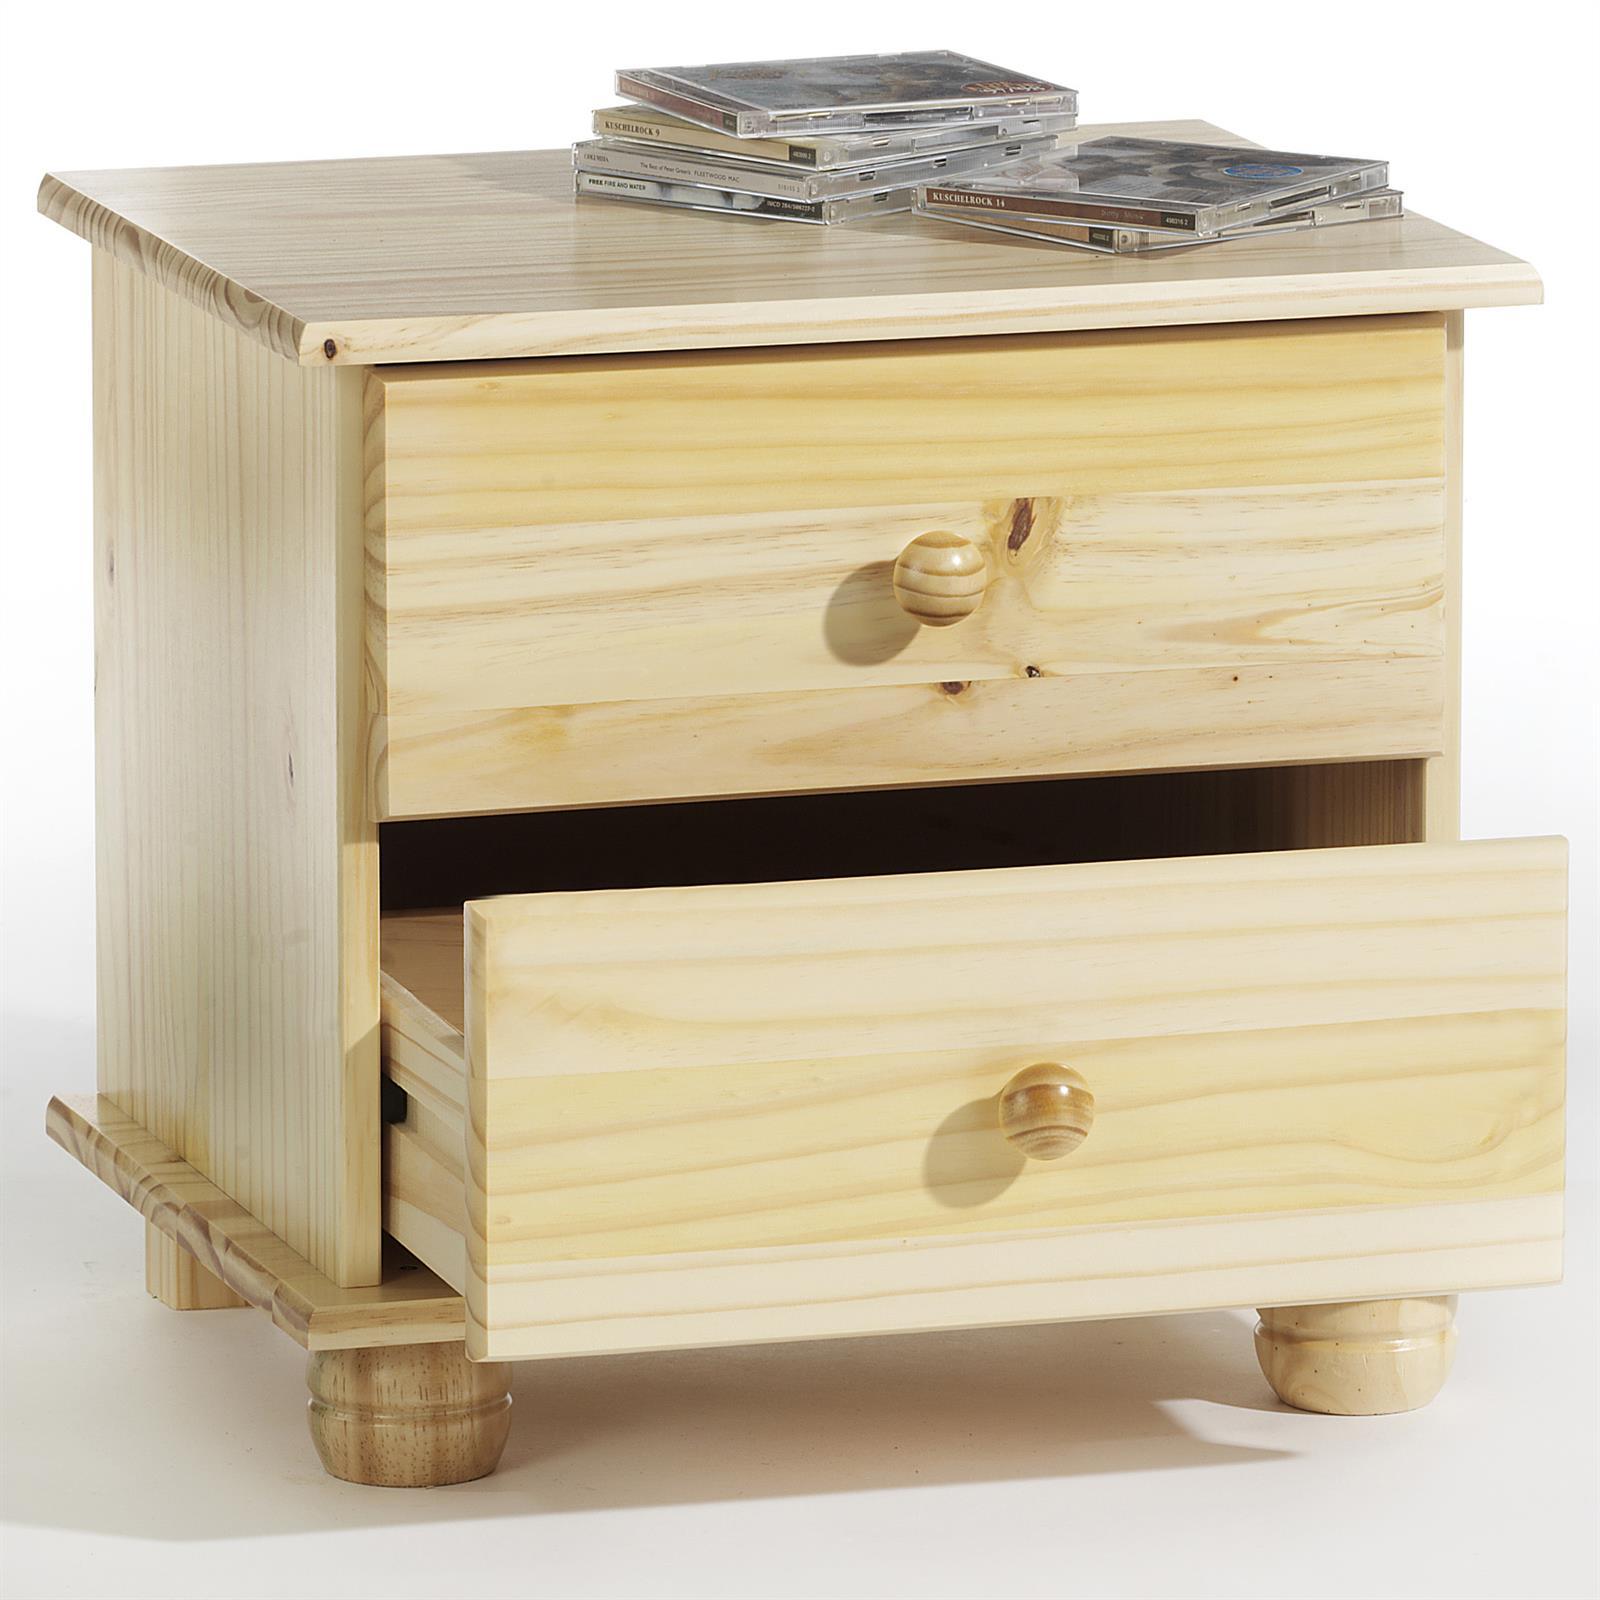 table de chevet en pin bern vernis naturel mobil meubles. Black Bedroom Furniture Sets. Home Design Ideas